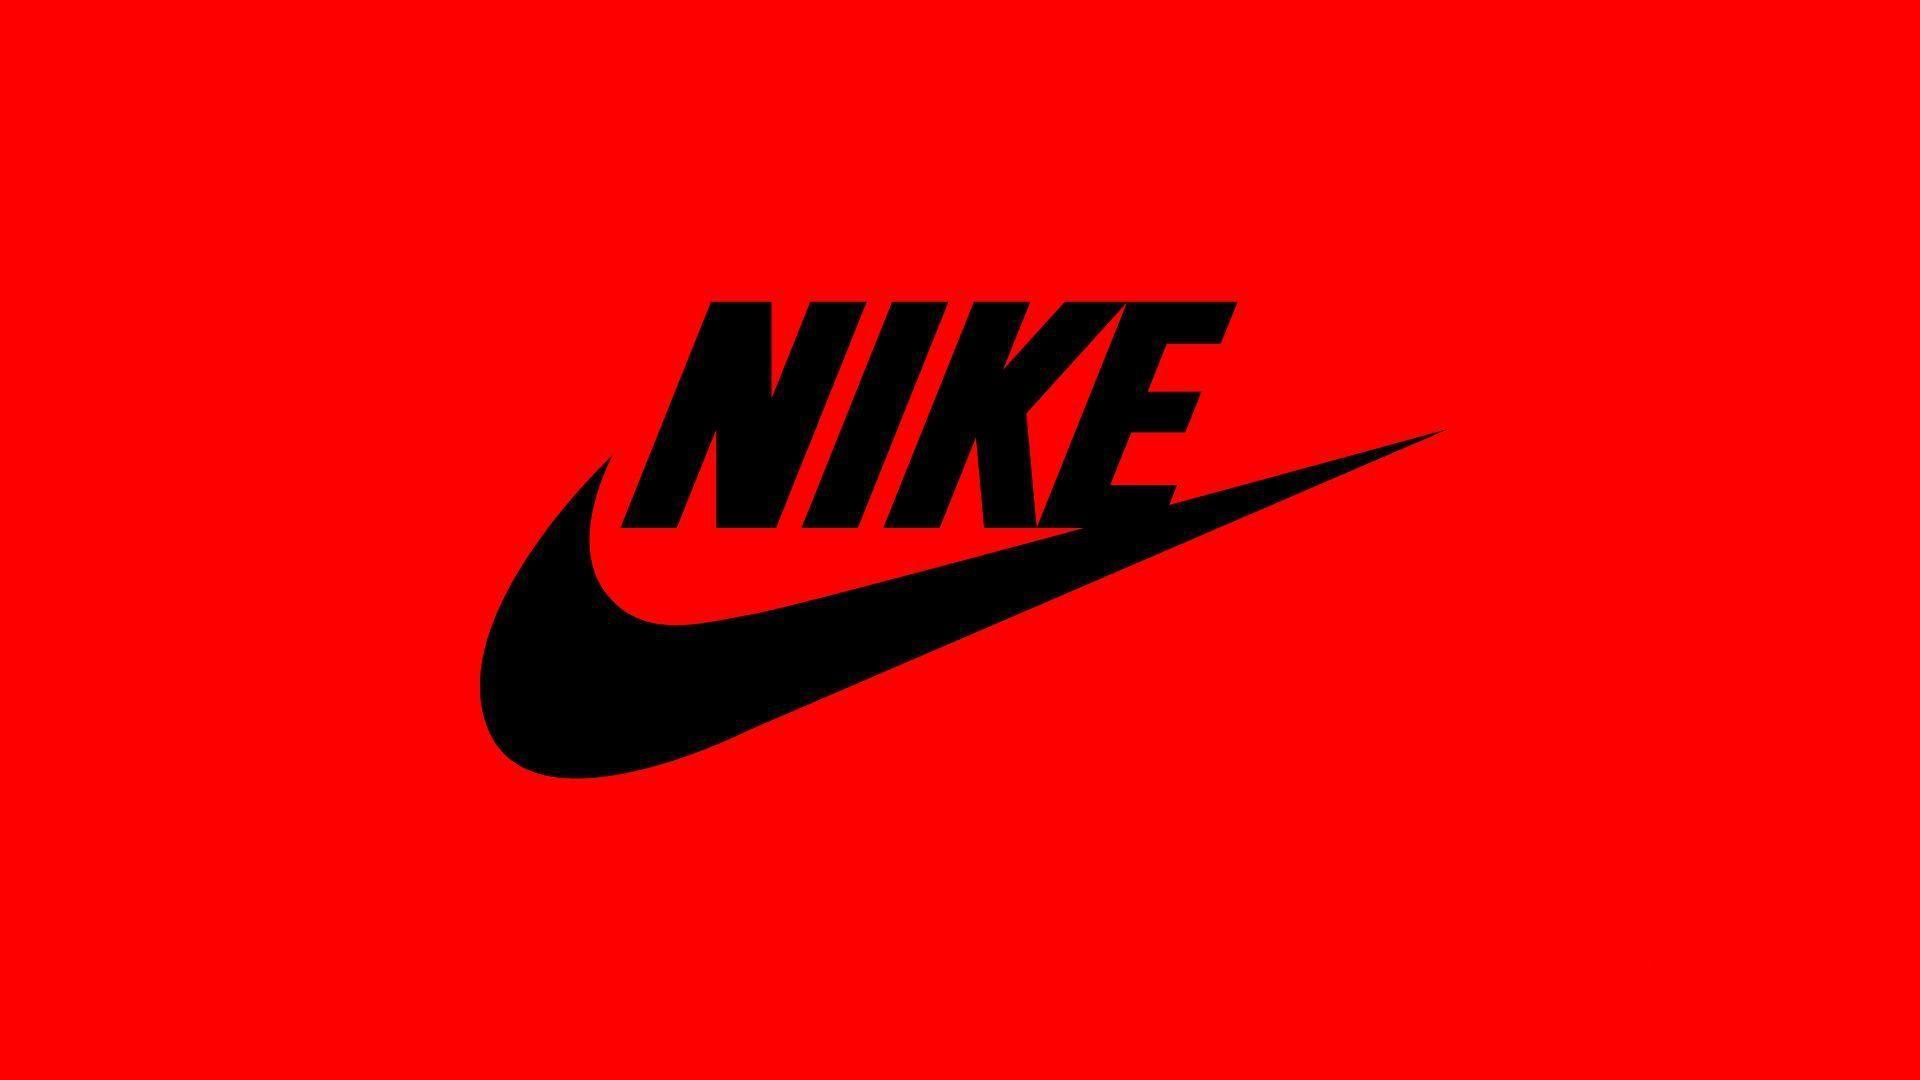 nike logo wallpapers hd 2016 wallpaper cave rh wallpapercave com Black Nike Logo nike logo wallpaper hd 2015